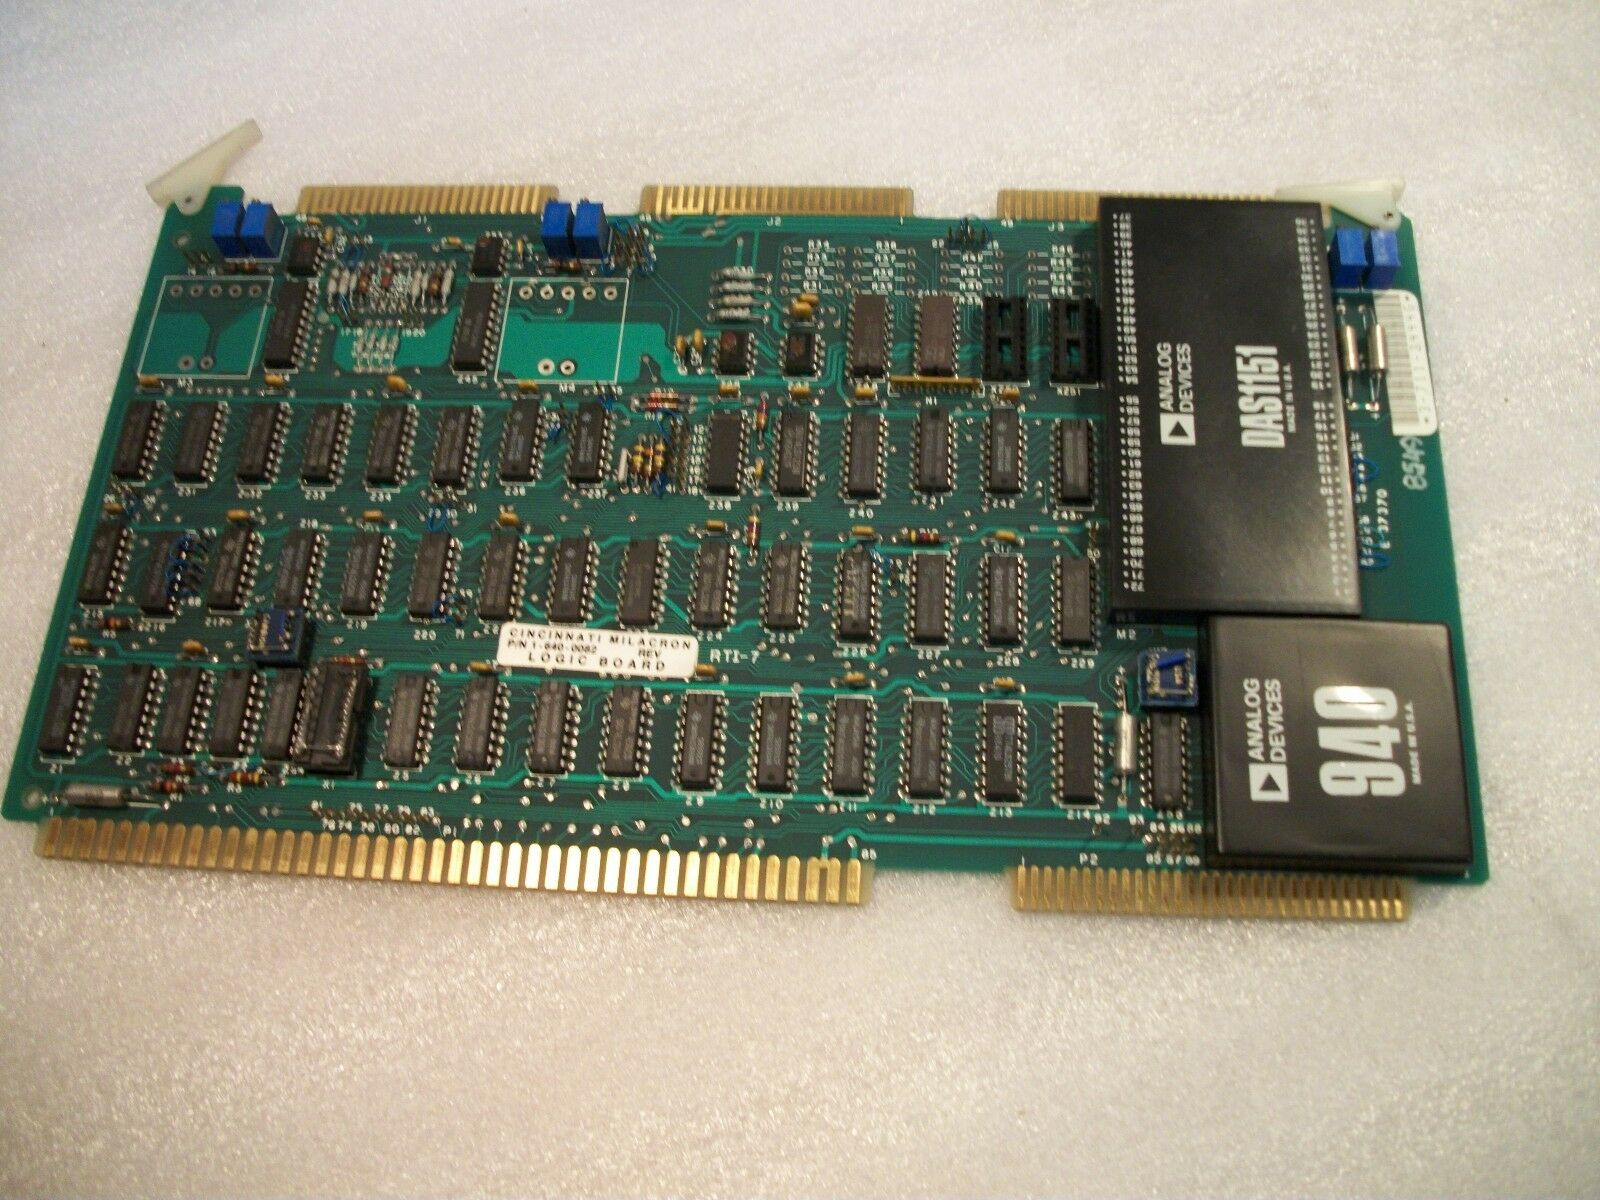 Cincinnati Acramatic Siemens Control Board # 3-711-2444G Logic Board